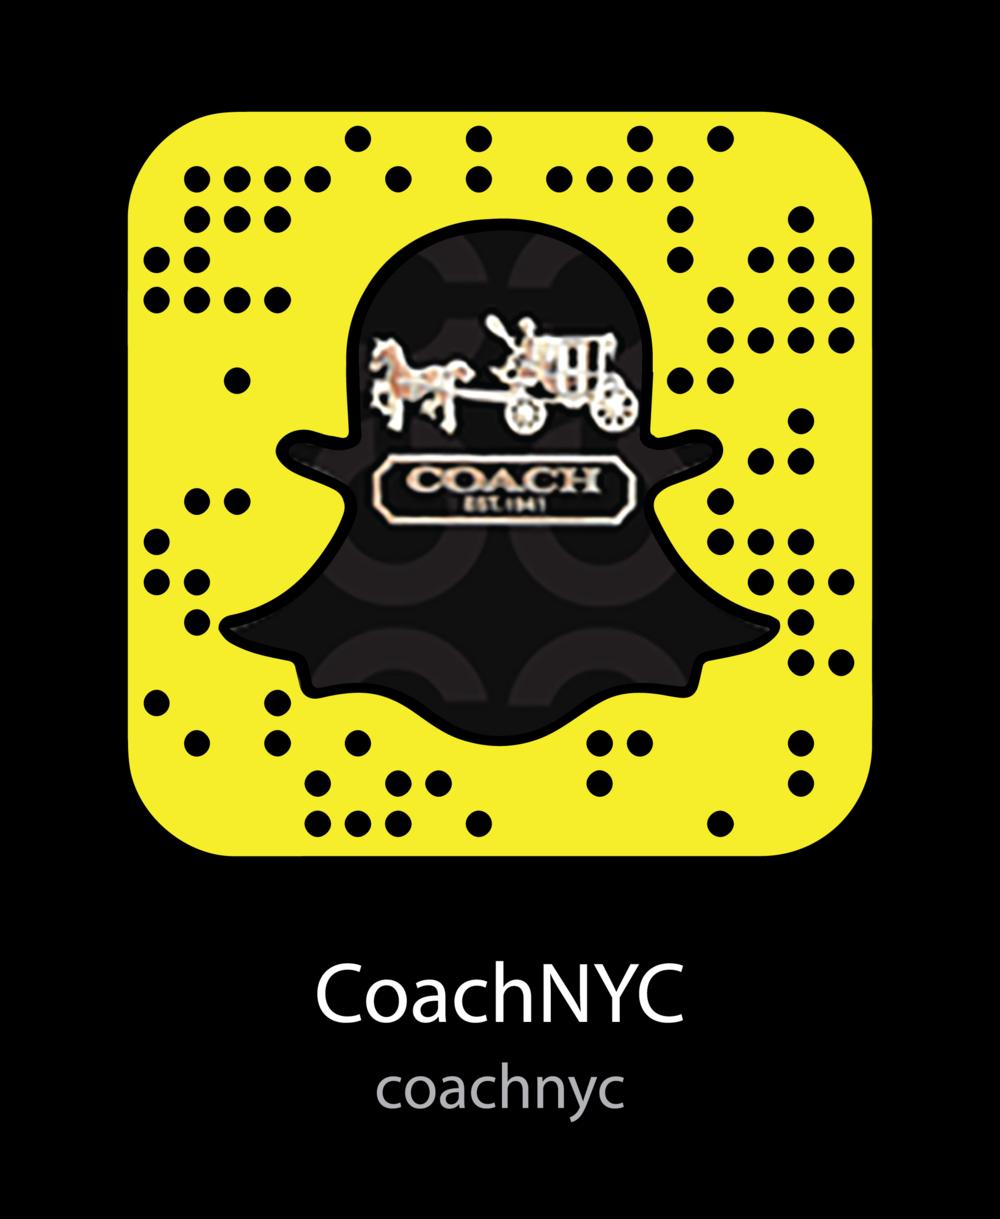 coachnyc-Brands-snapchat-snapcode.png